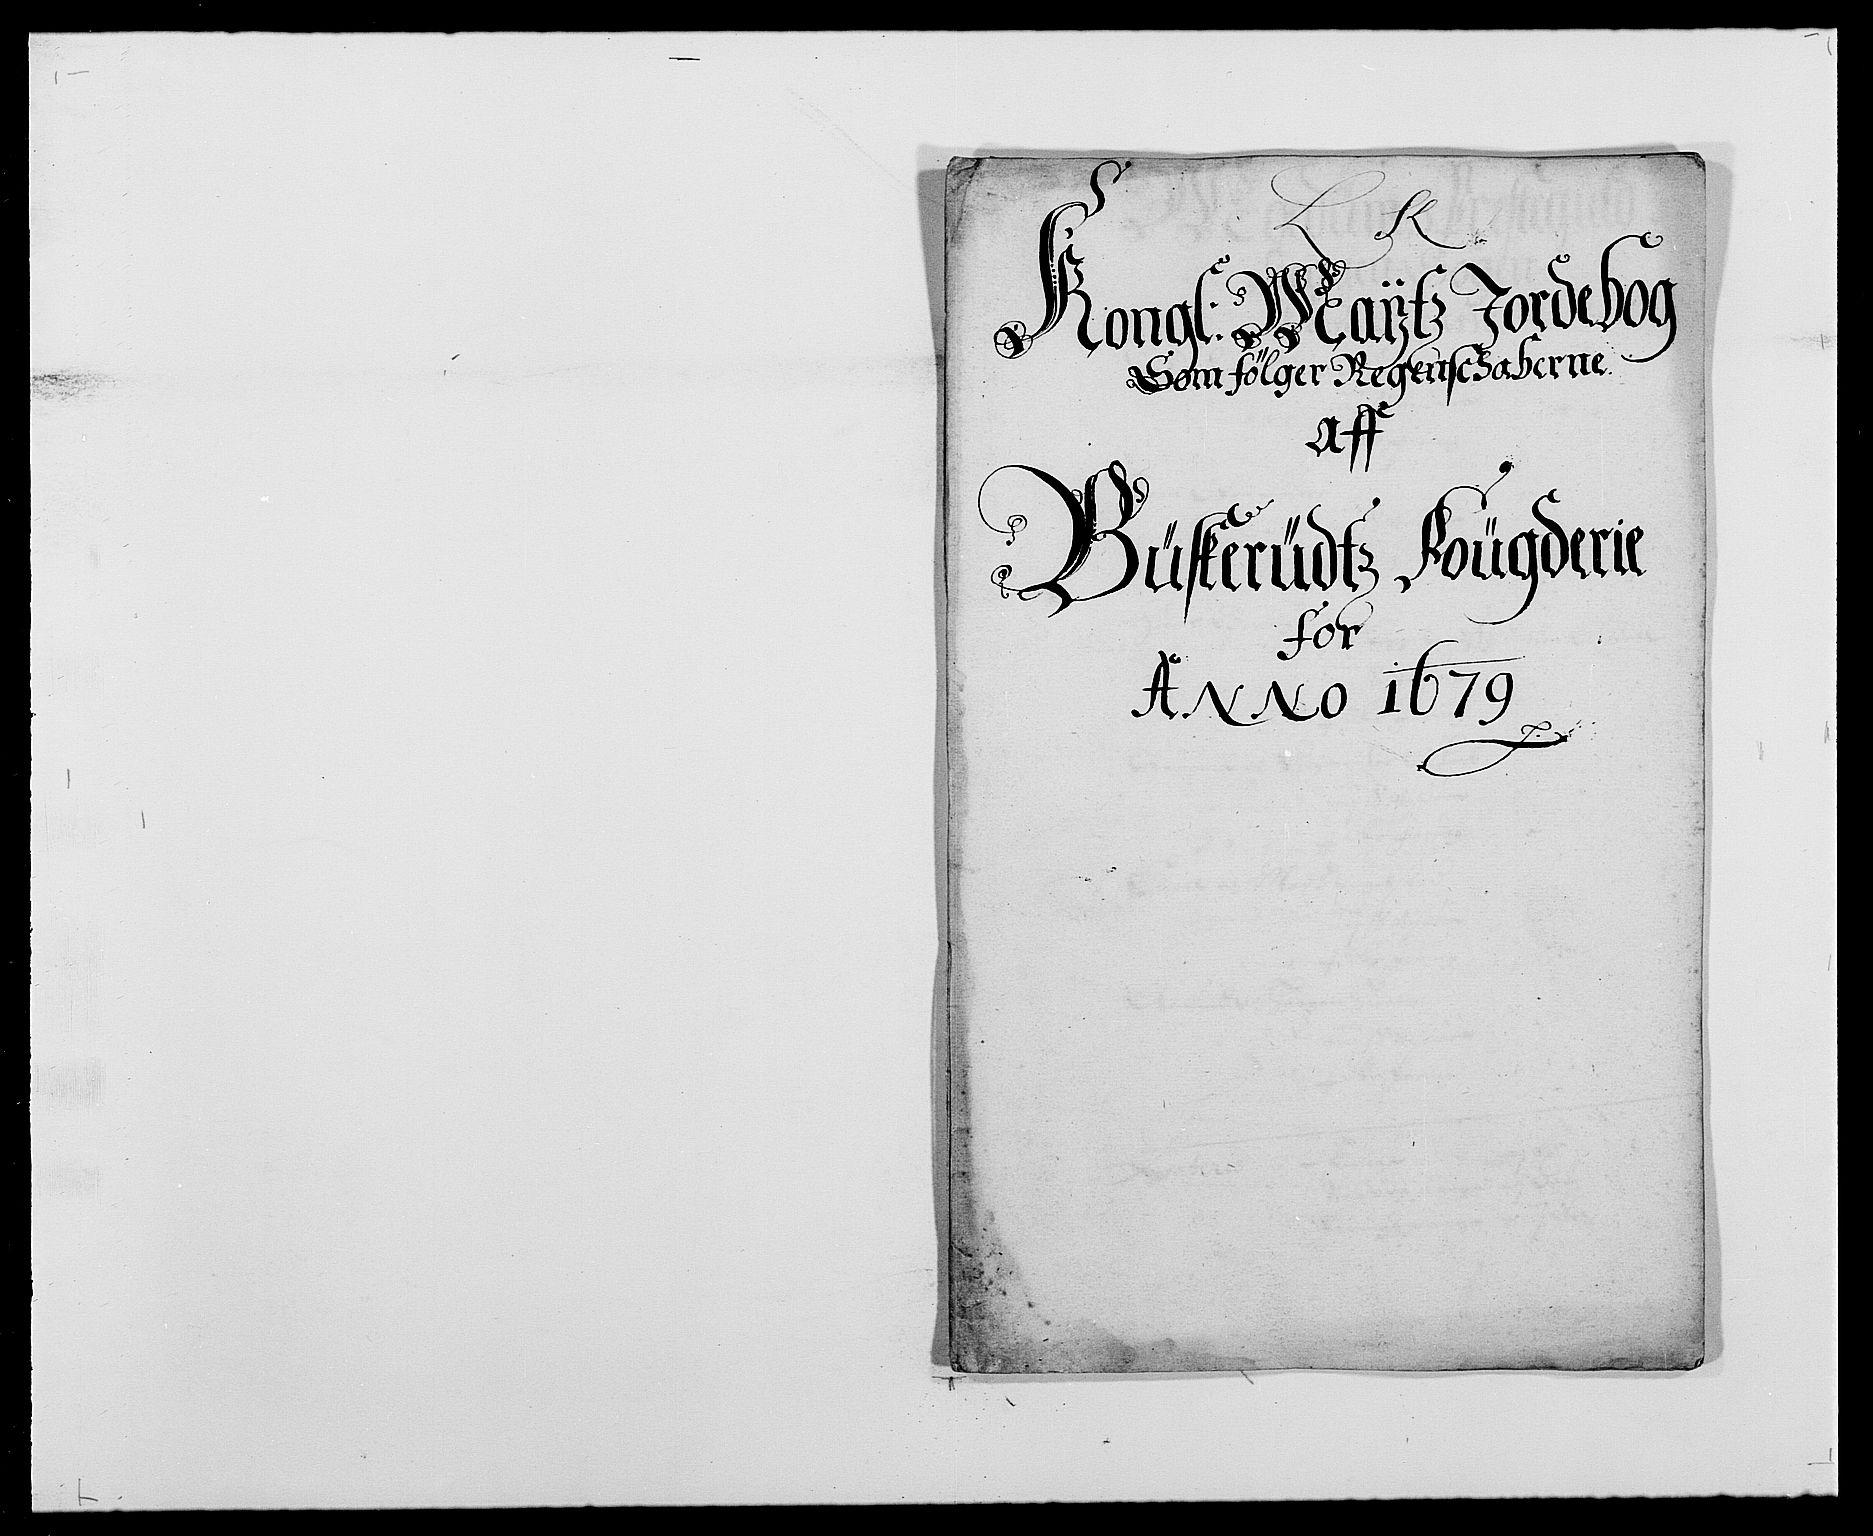 RA, Rentekammeret inntil 1814, Reviderte regnskaper, Fogderegnskap, R25/L1674: Fogderegnskap Buskerud, 1678-1681, s. 202